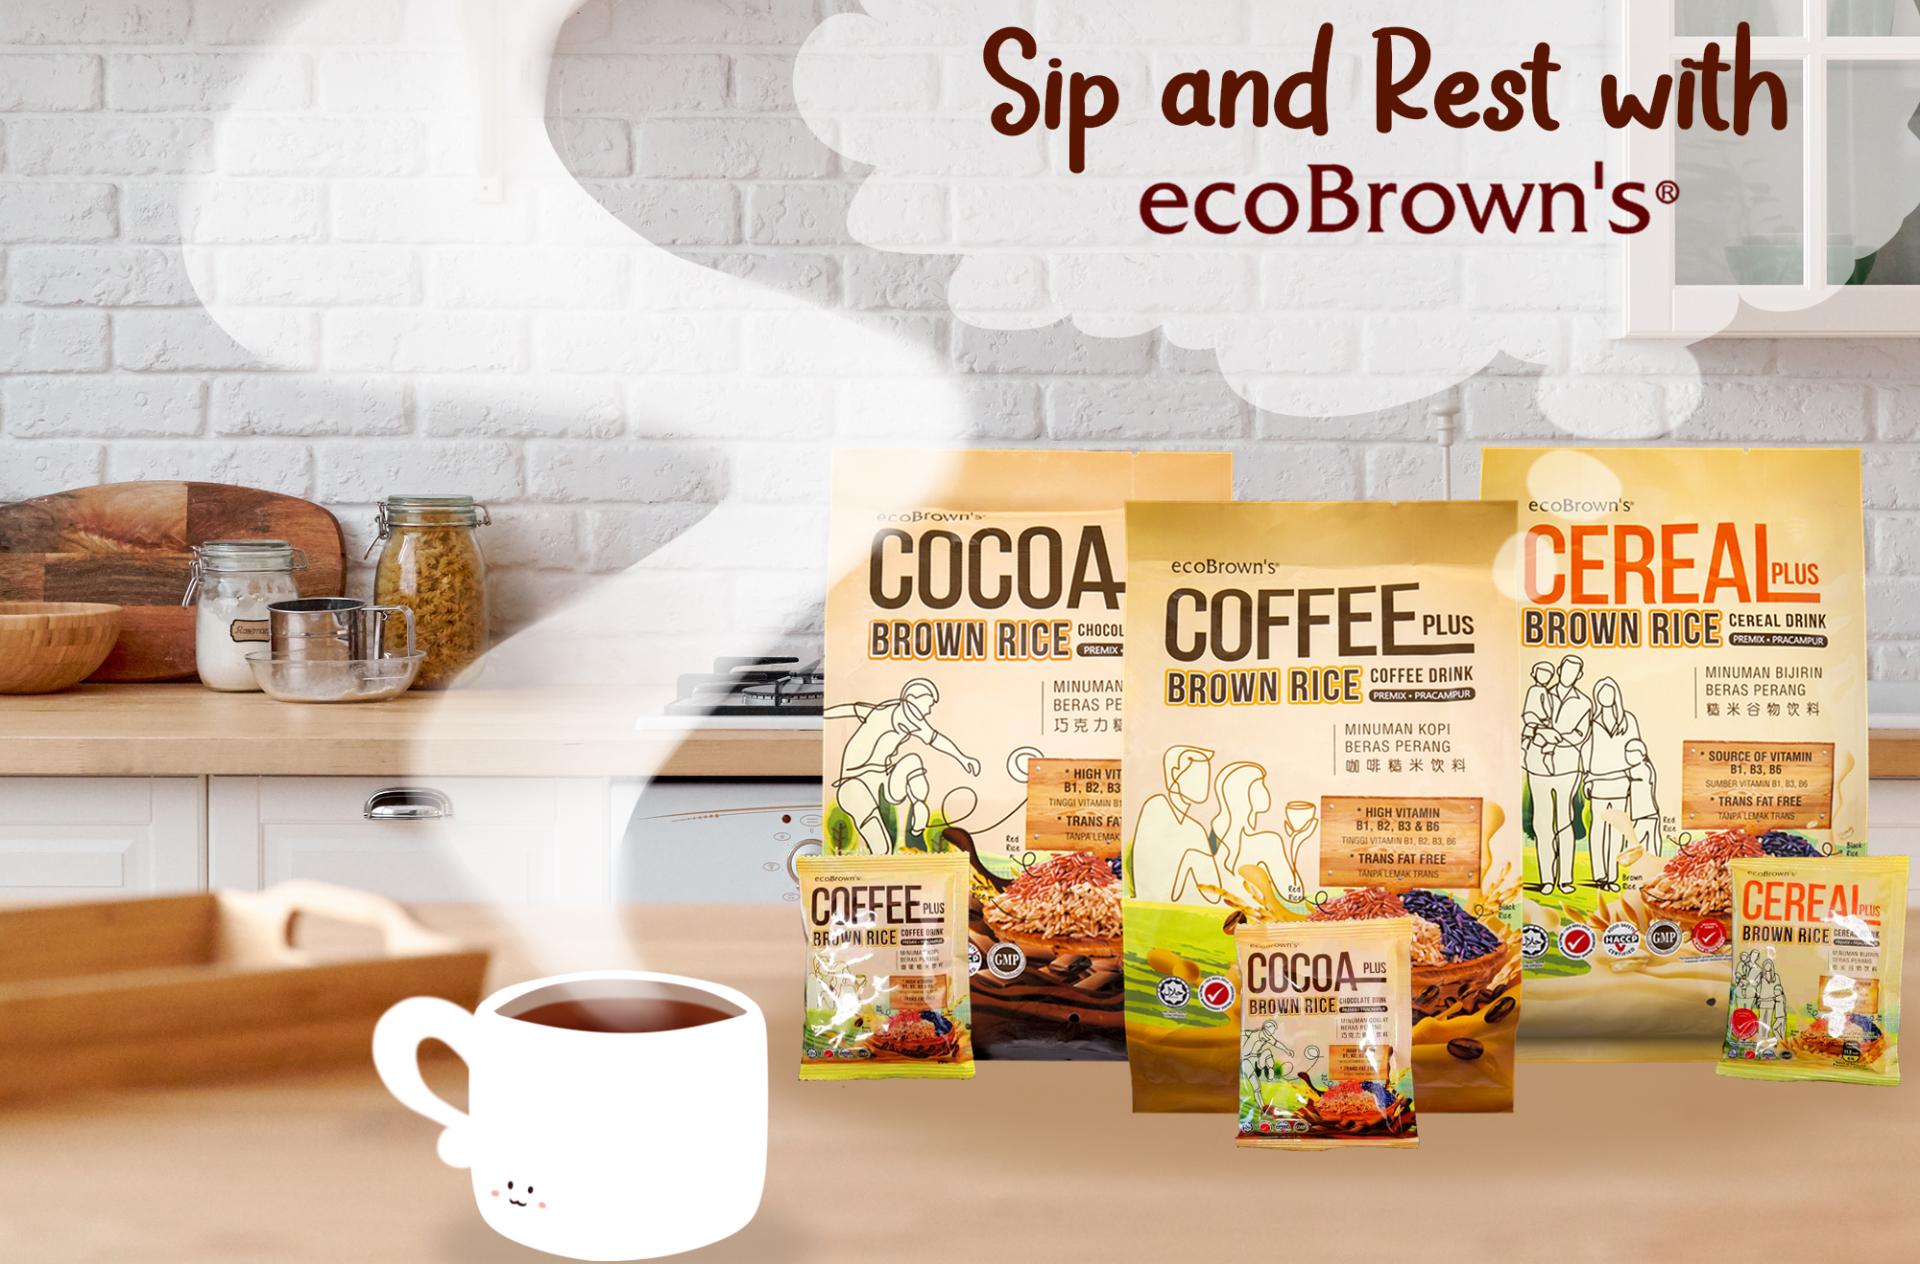 ecoBrown PLUS系列糙米饮料共有3种口味。-ecoBrown提供-